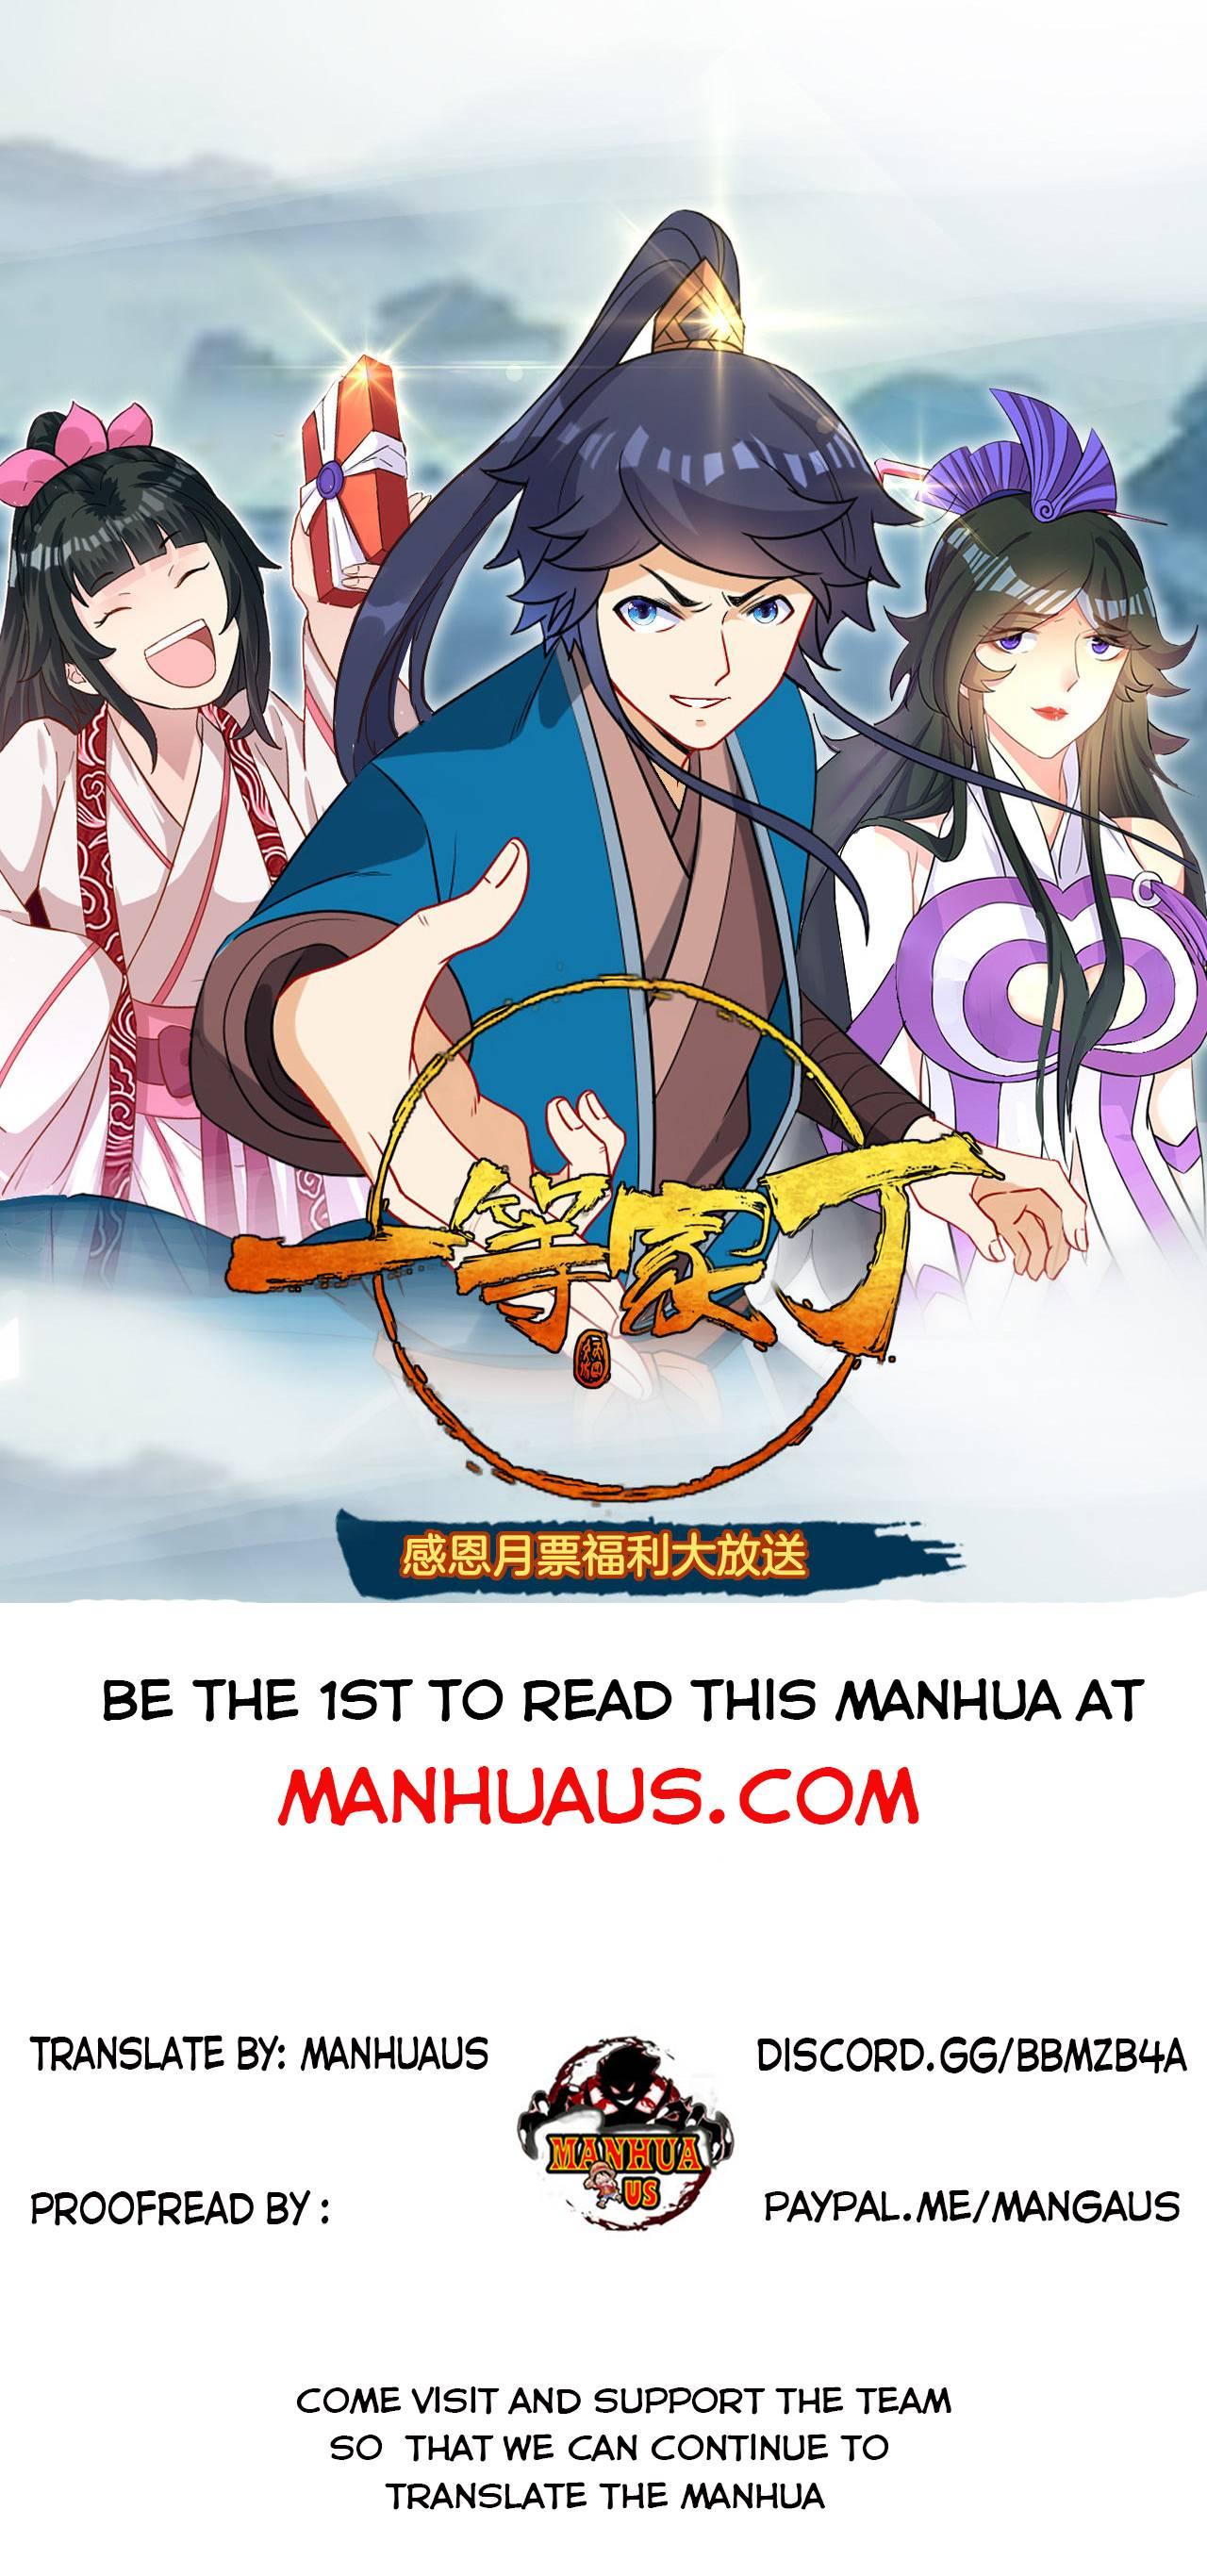 https://img3.nineanime.com/comics/pic4/9/36553/3265271/8eb08b4fb030ec91dfca756982015ee7.jpg Page 1